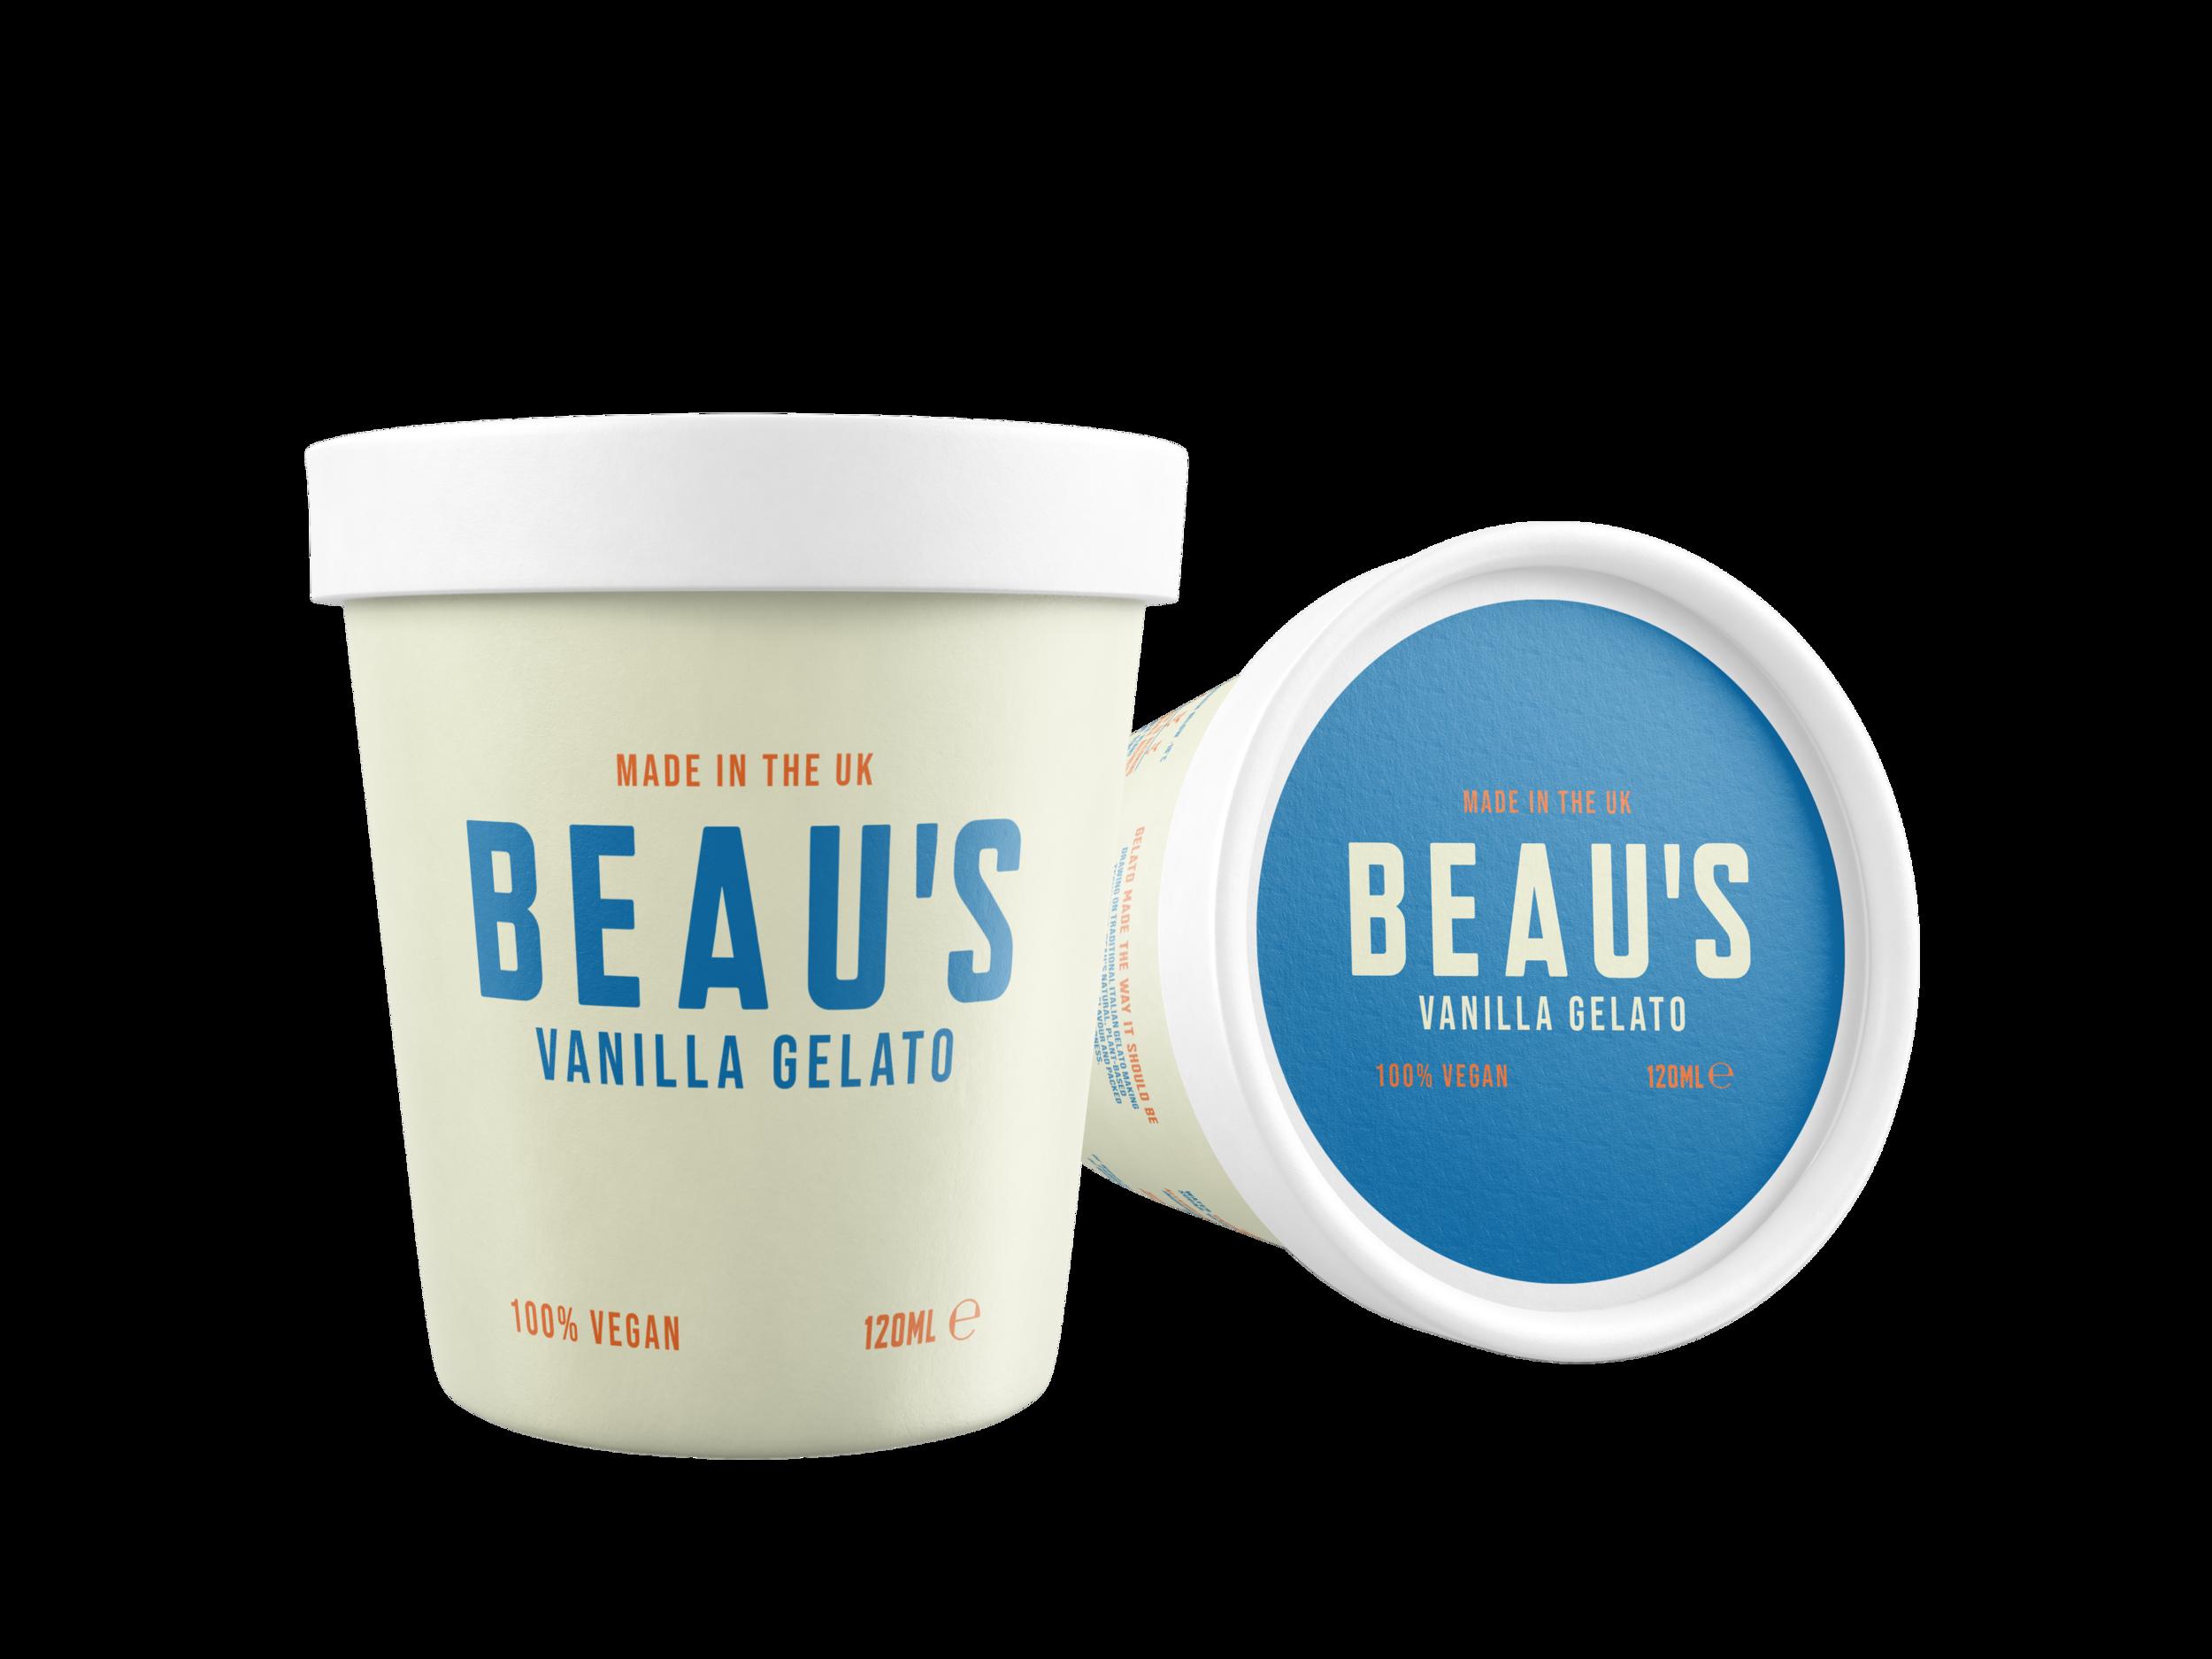 Beau's Vanilla 120ml tub design